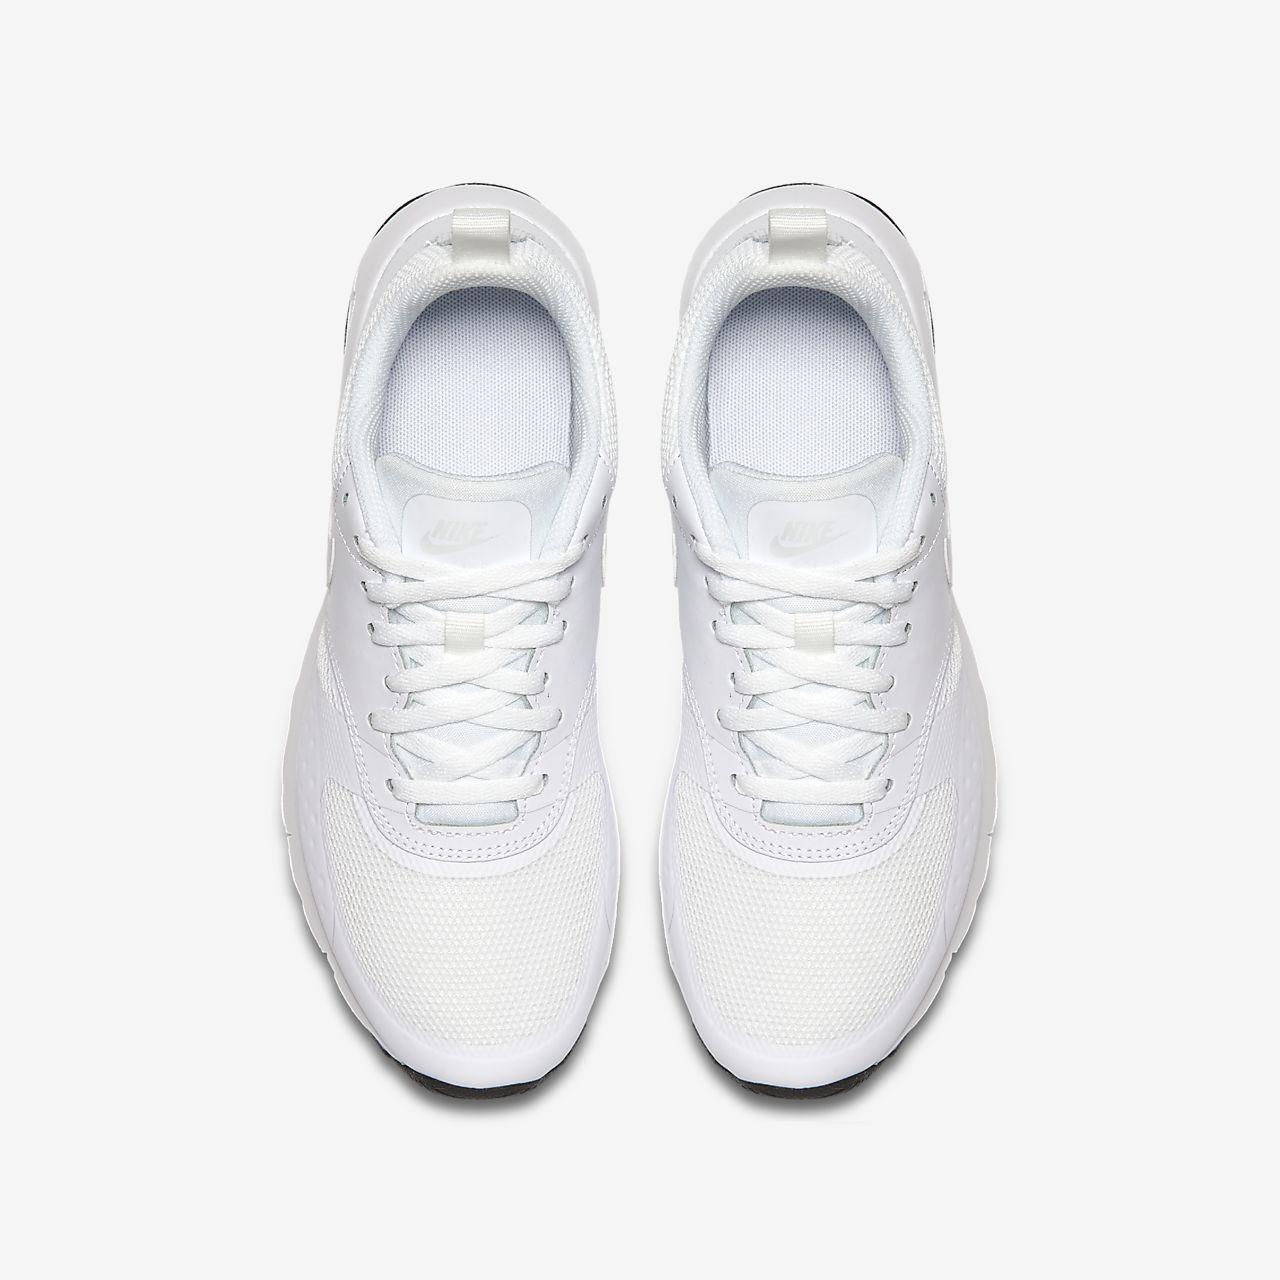 Scarpa Nike Air Max Vision Ragazzi